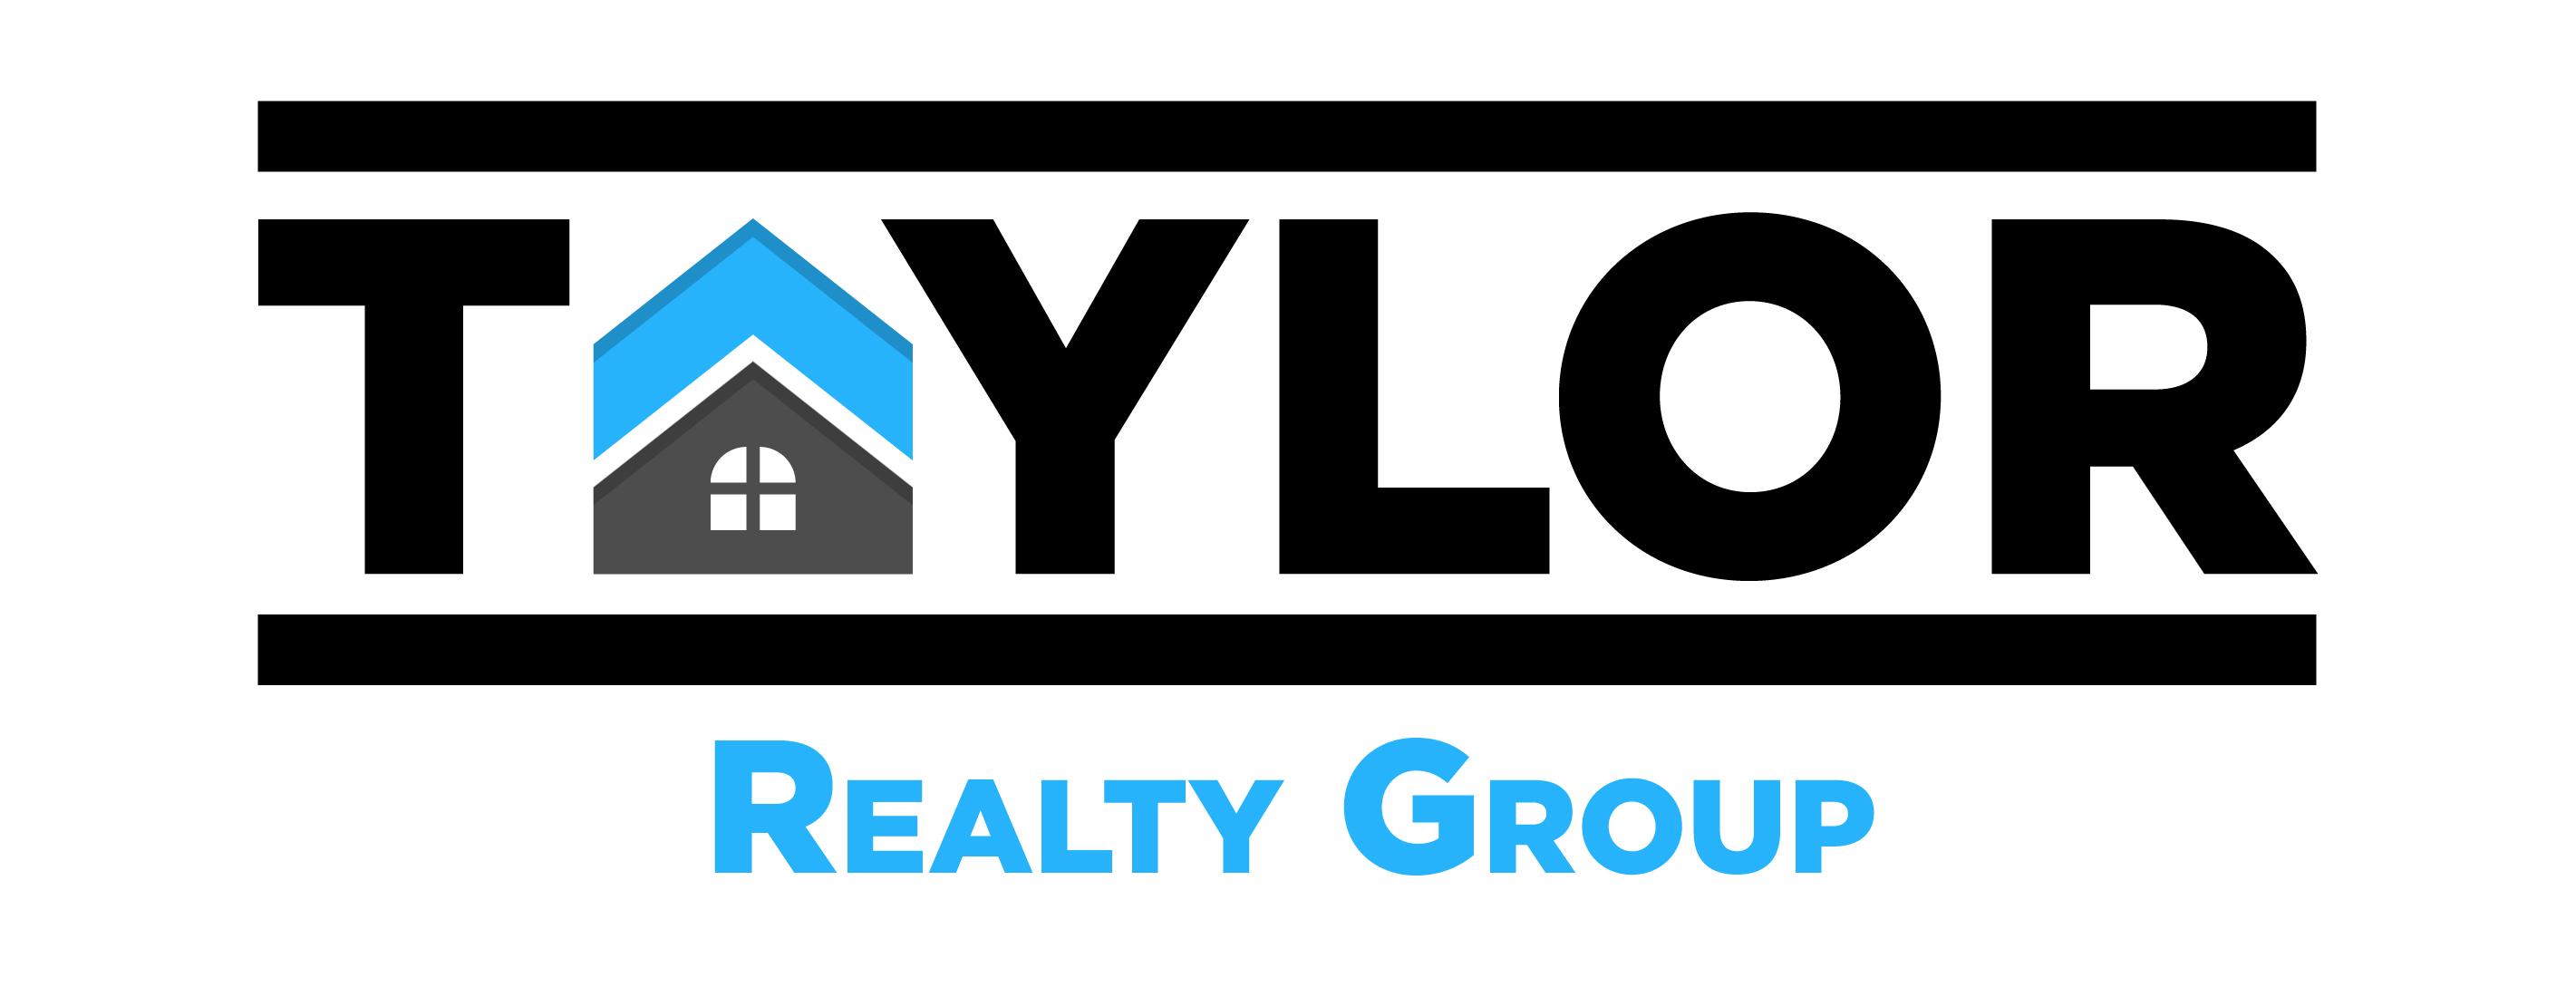 Taylor Realty Group Logo